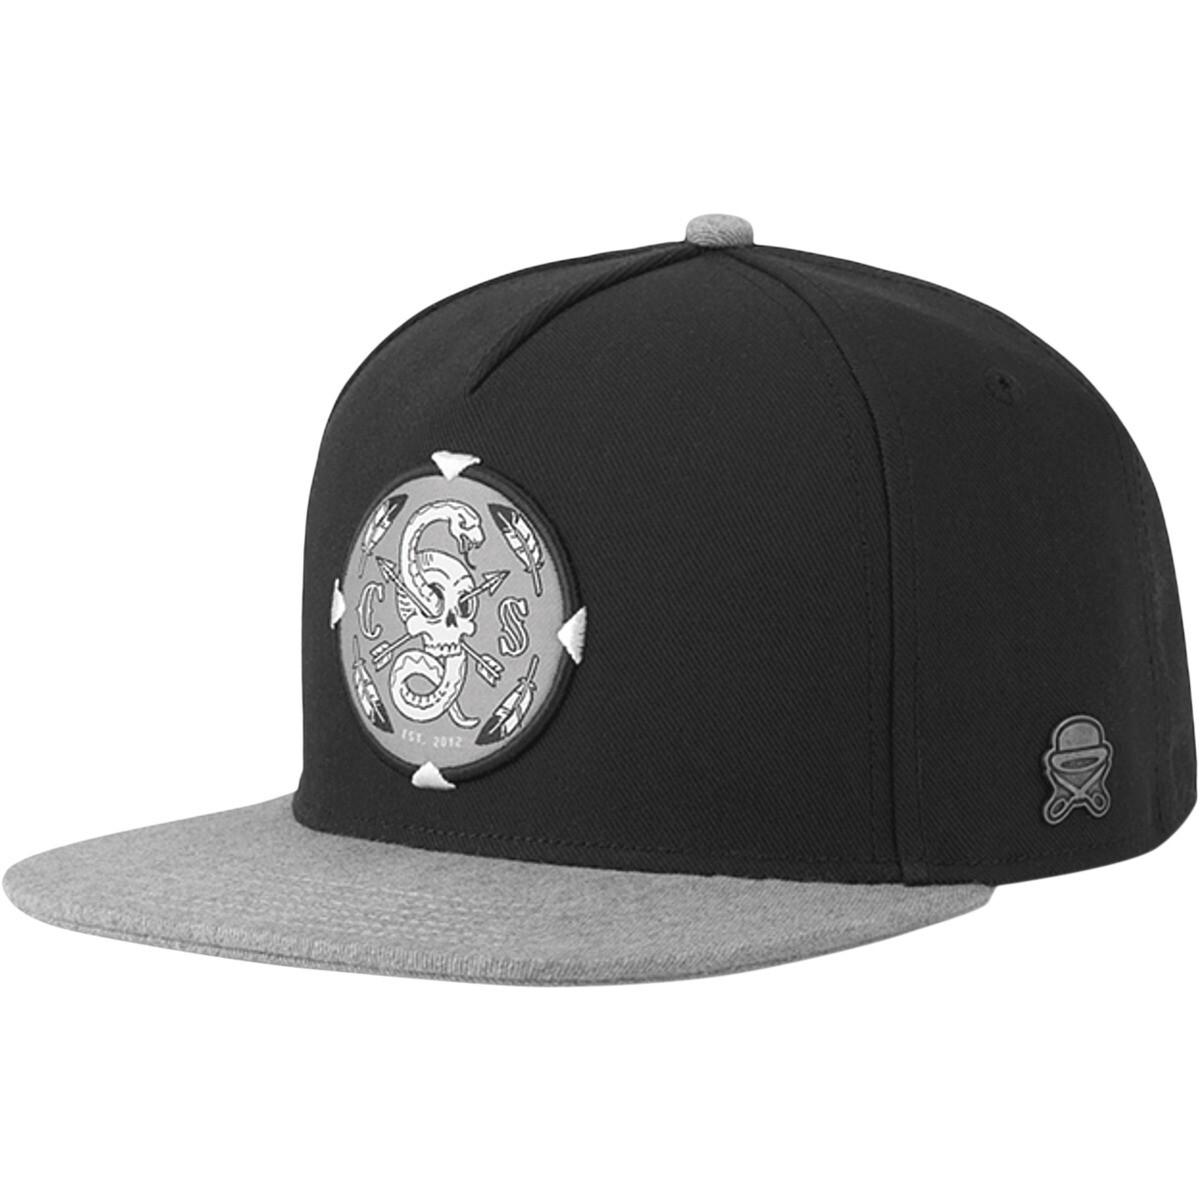 C&S CL Native Shield Cap